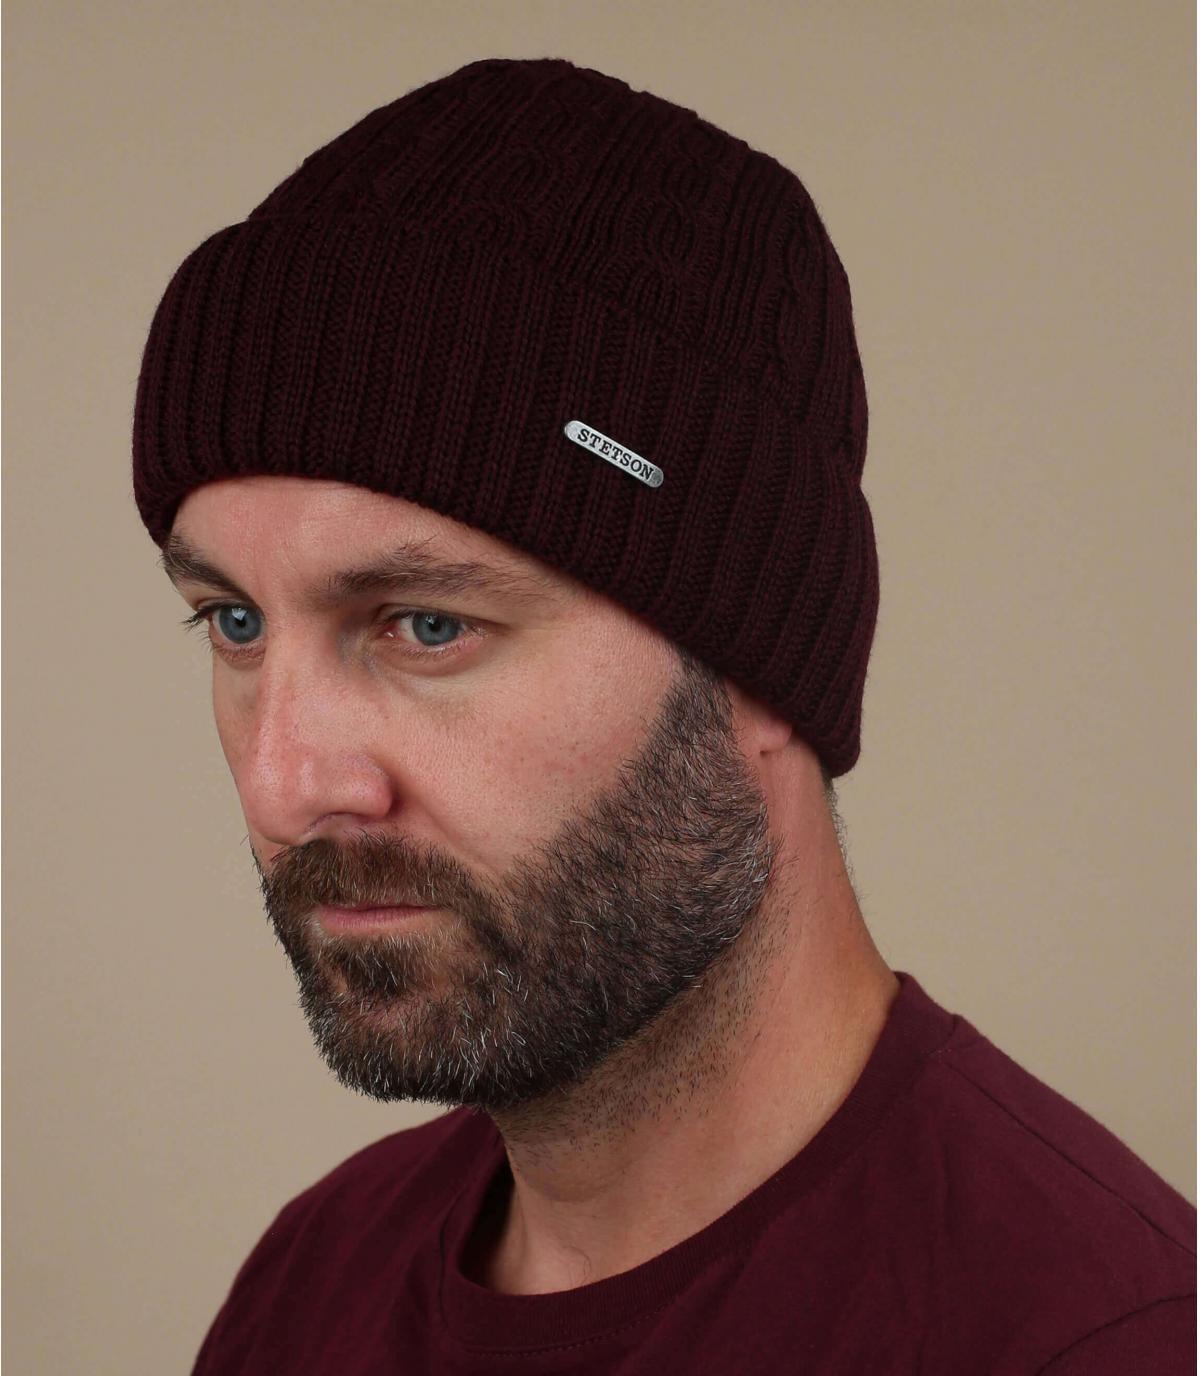 Mütze Revers bordeaux Wolle